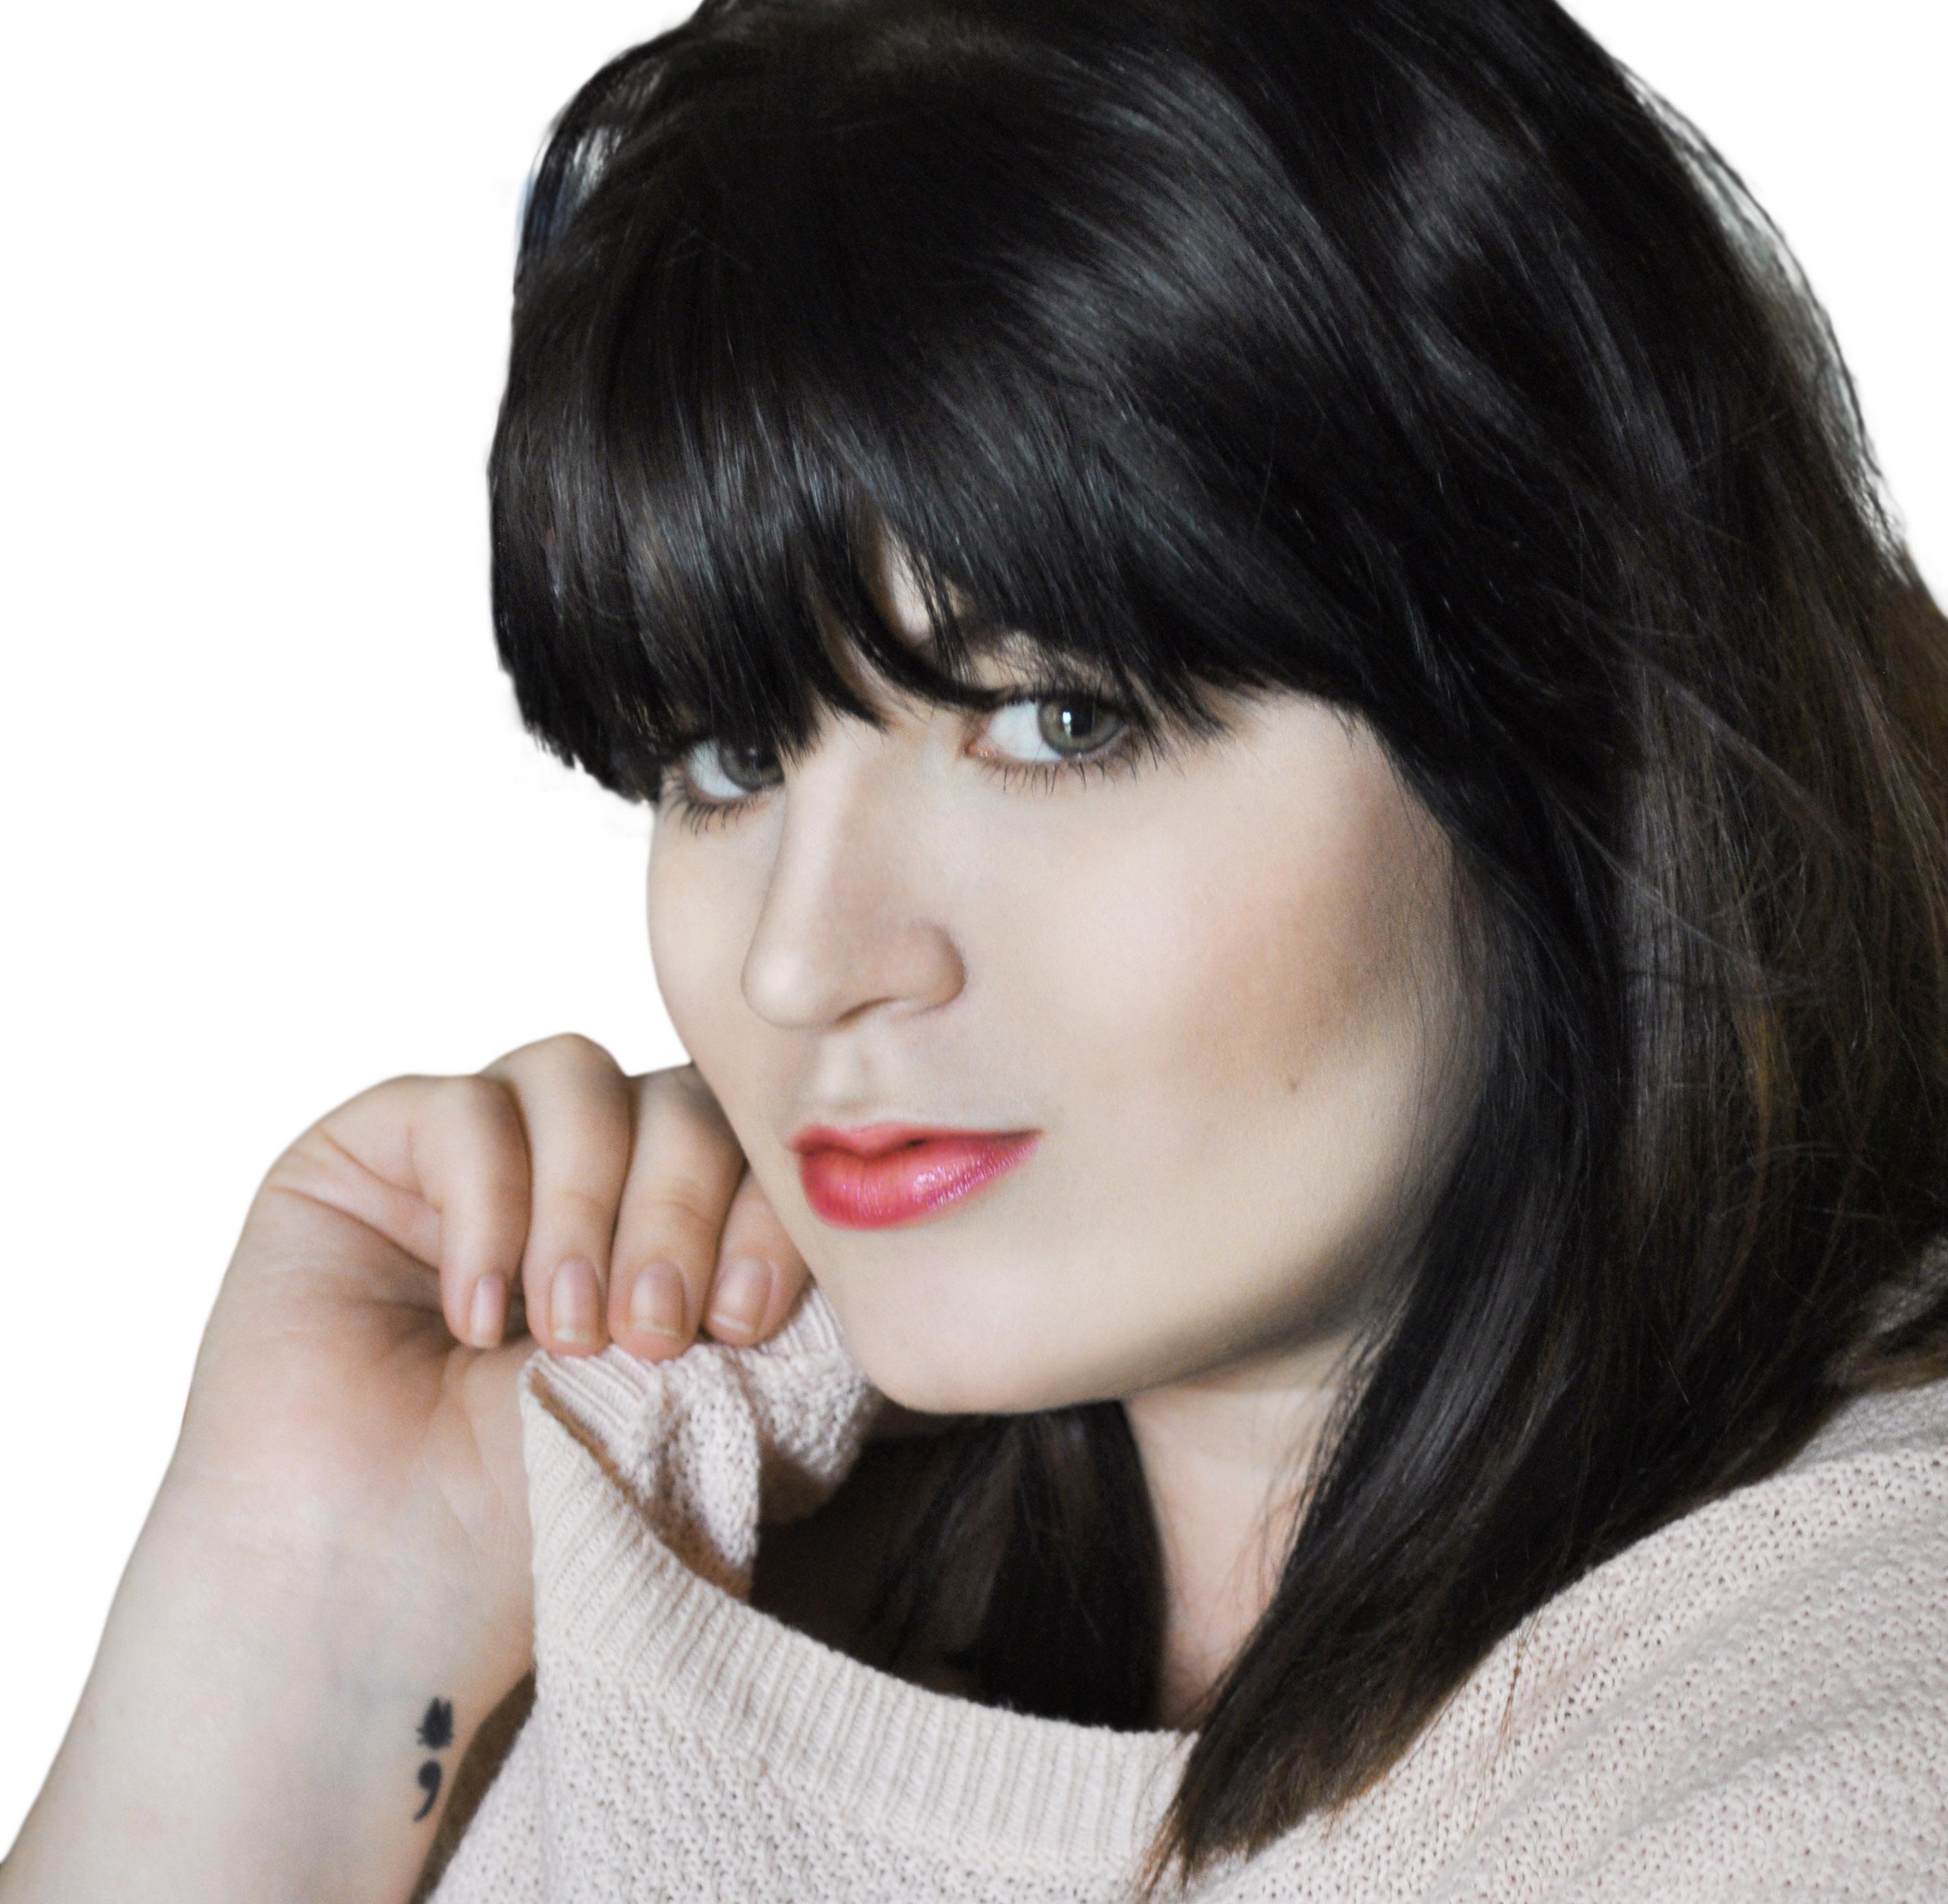 Carla Mouton. PHOTO: Marianke Saayman